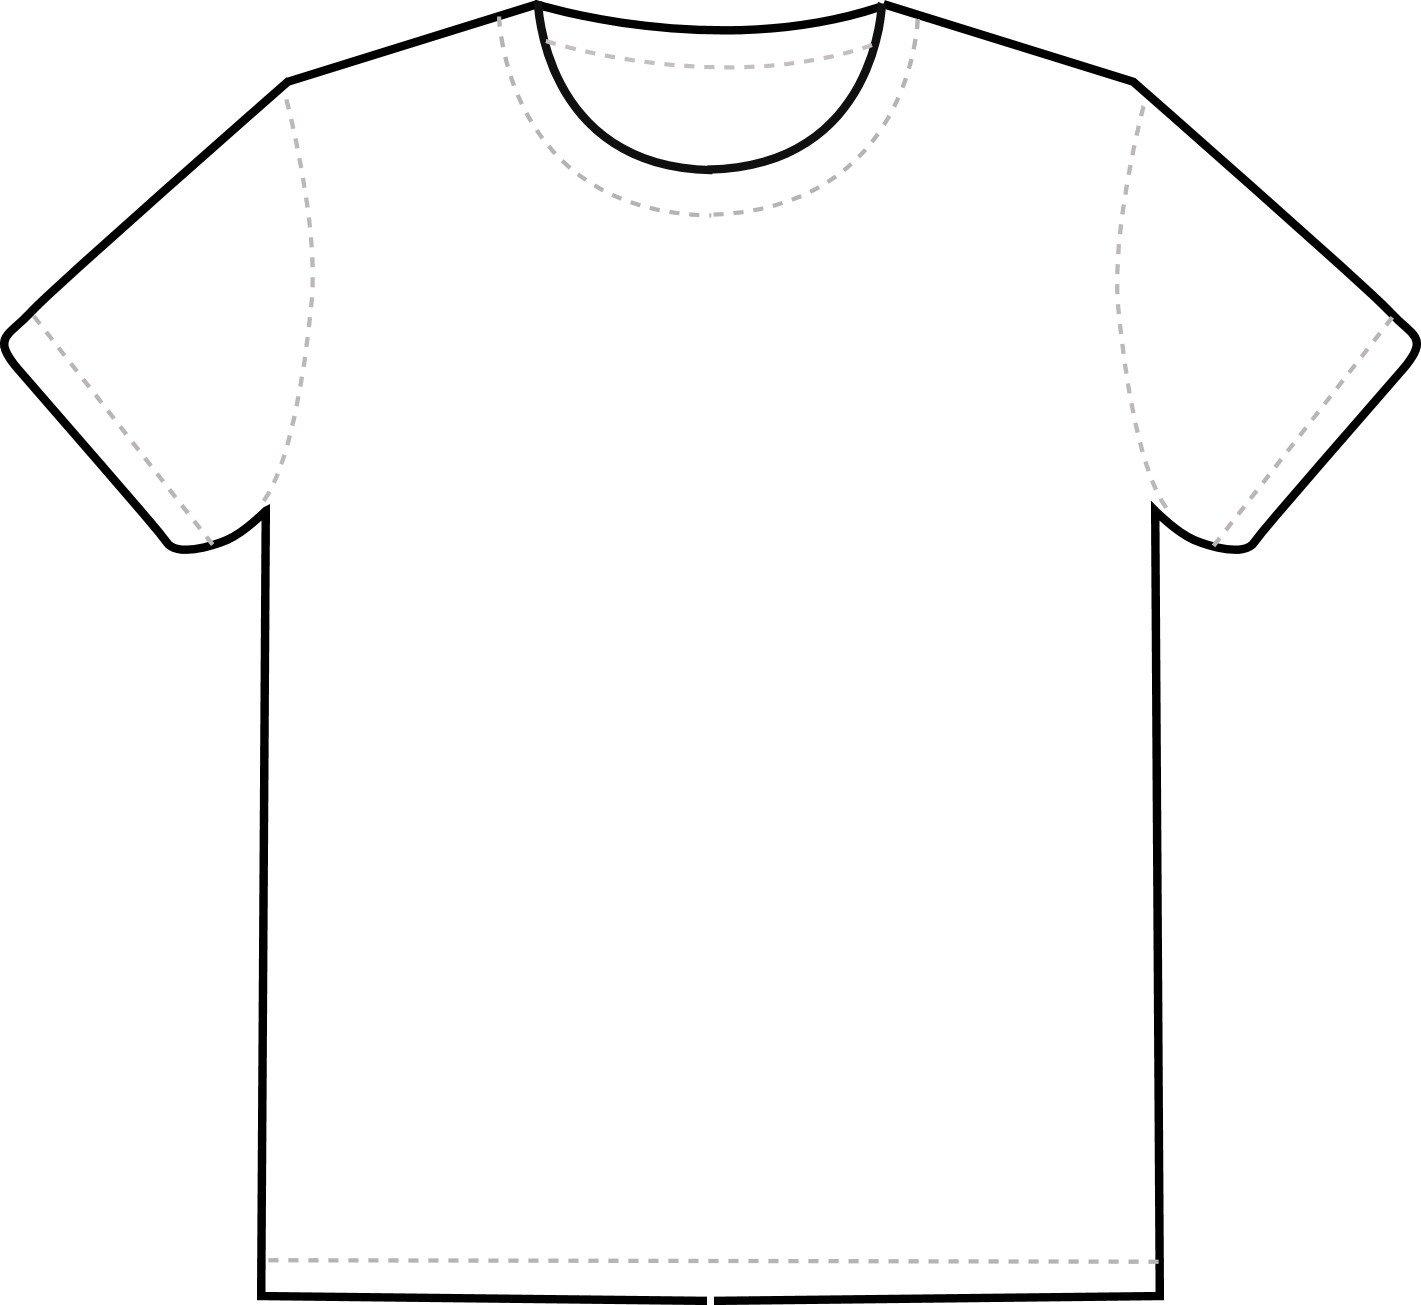 Tee Shirt Design Template Free T Shirt Template Printable Download Free Clip Art